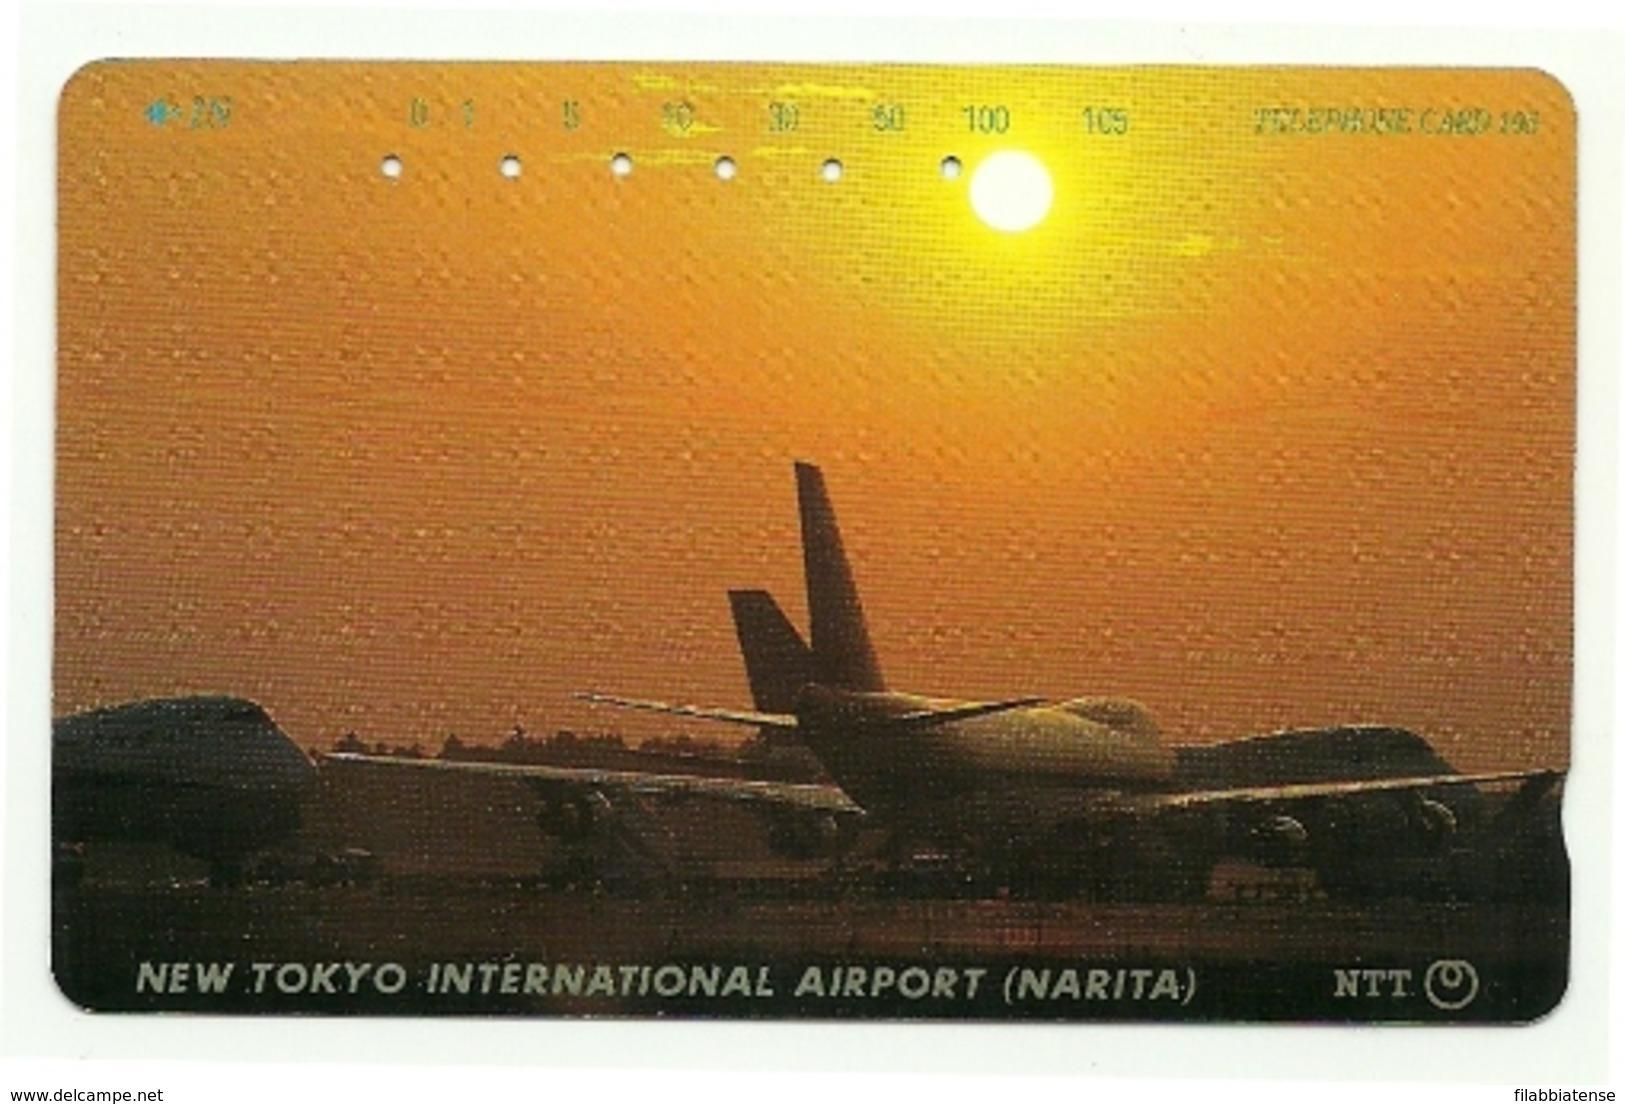 Giappone - Tessera Telefonica Da 105 Units T202 - NTT, - Avions